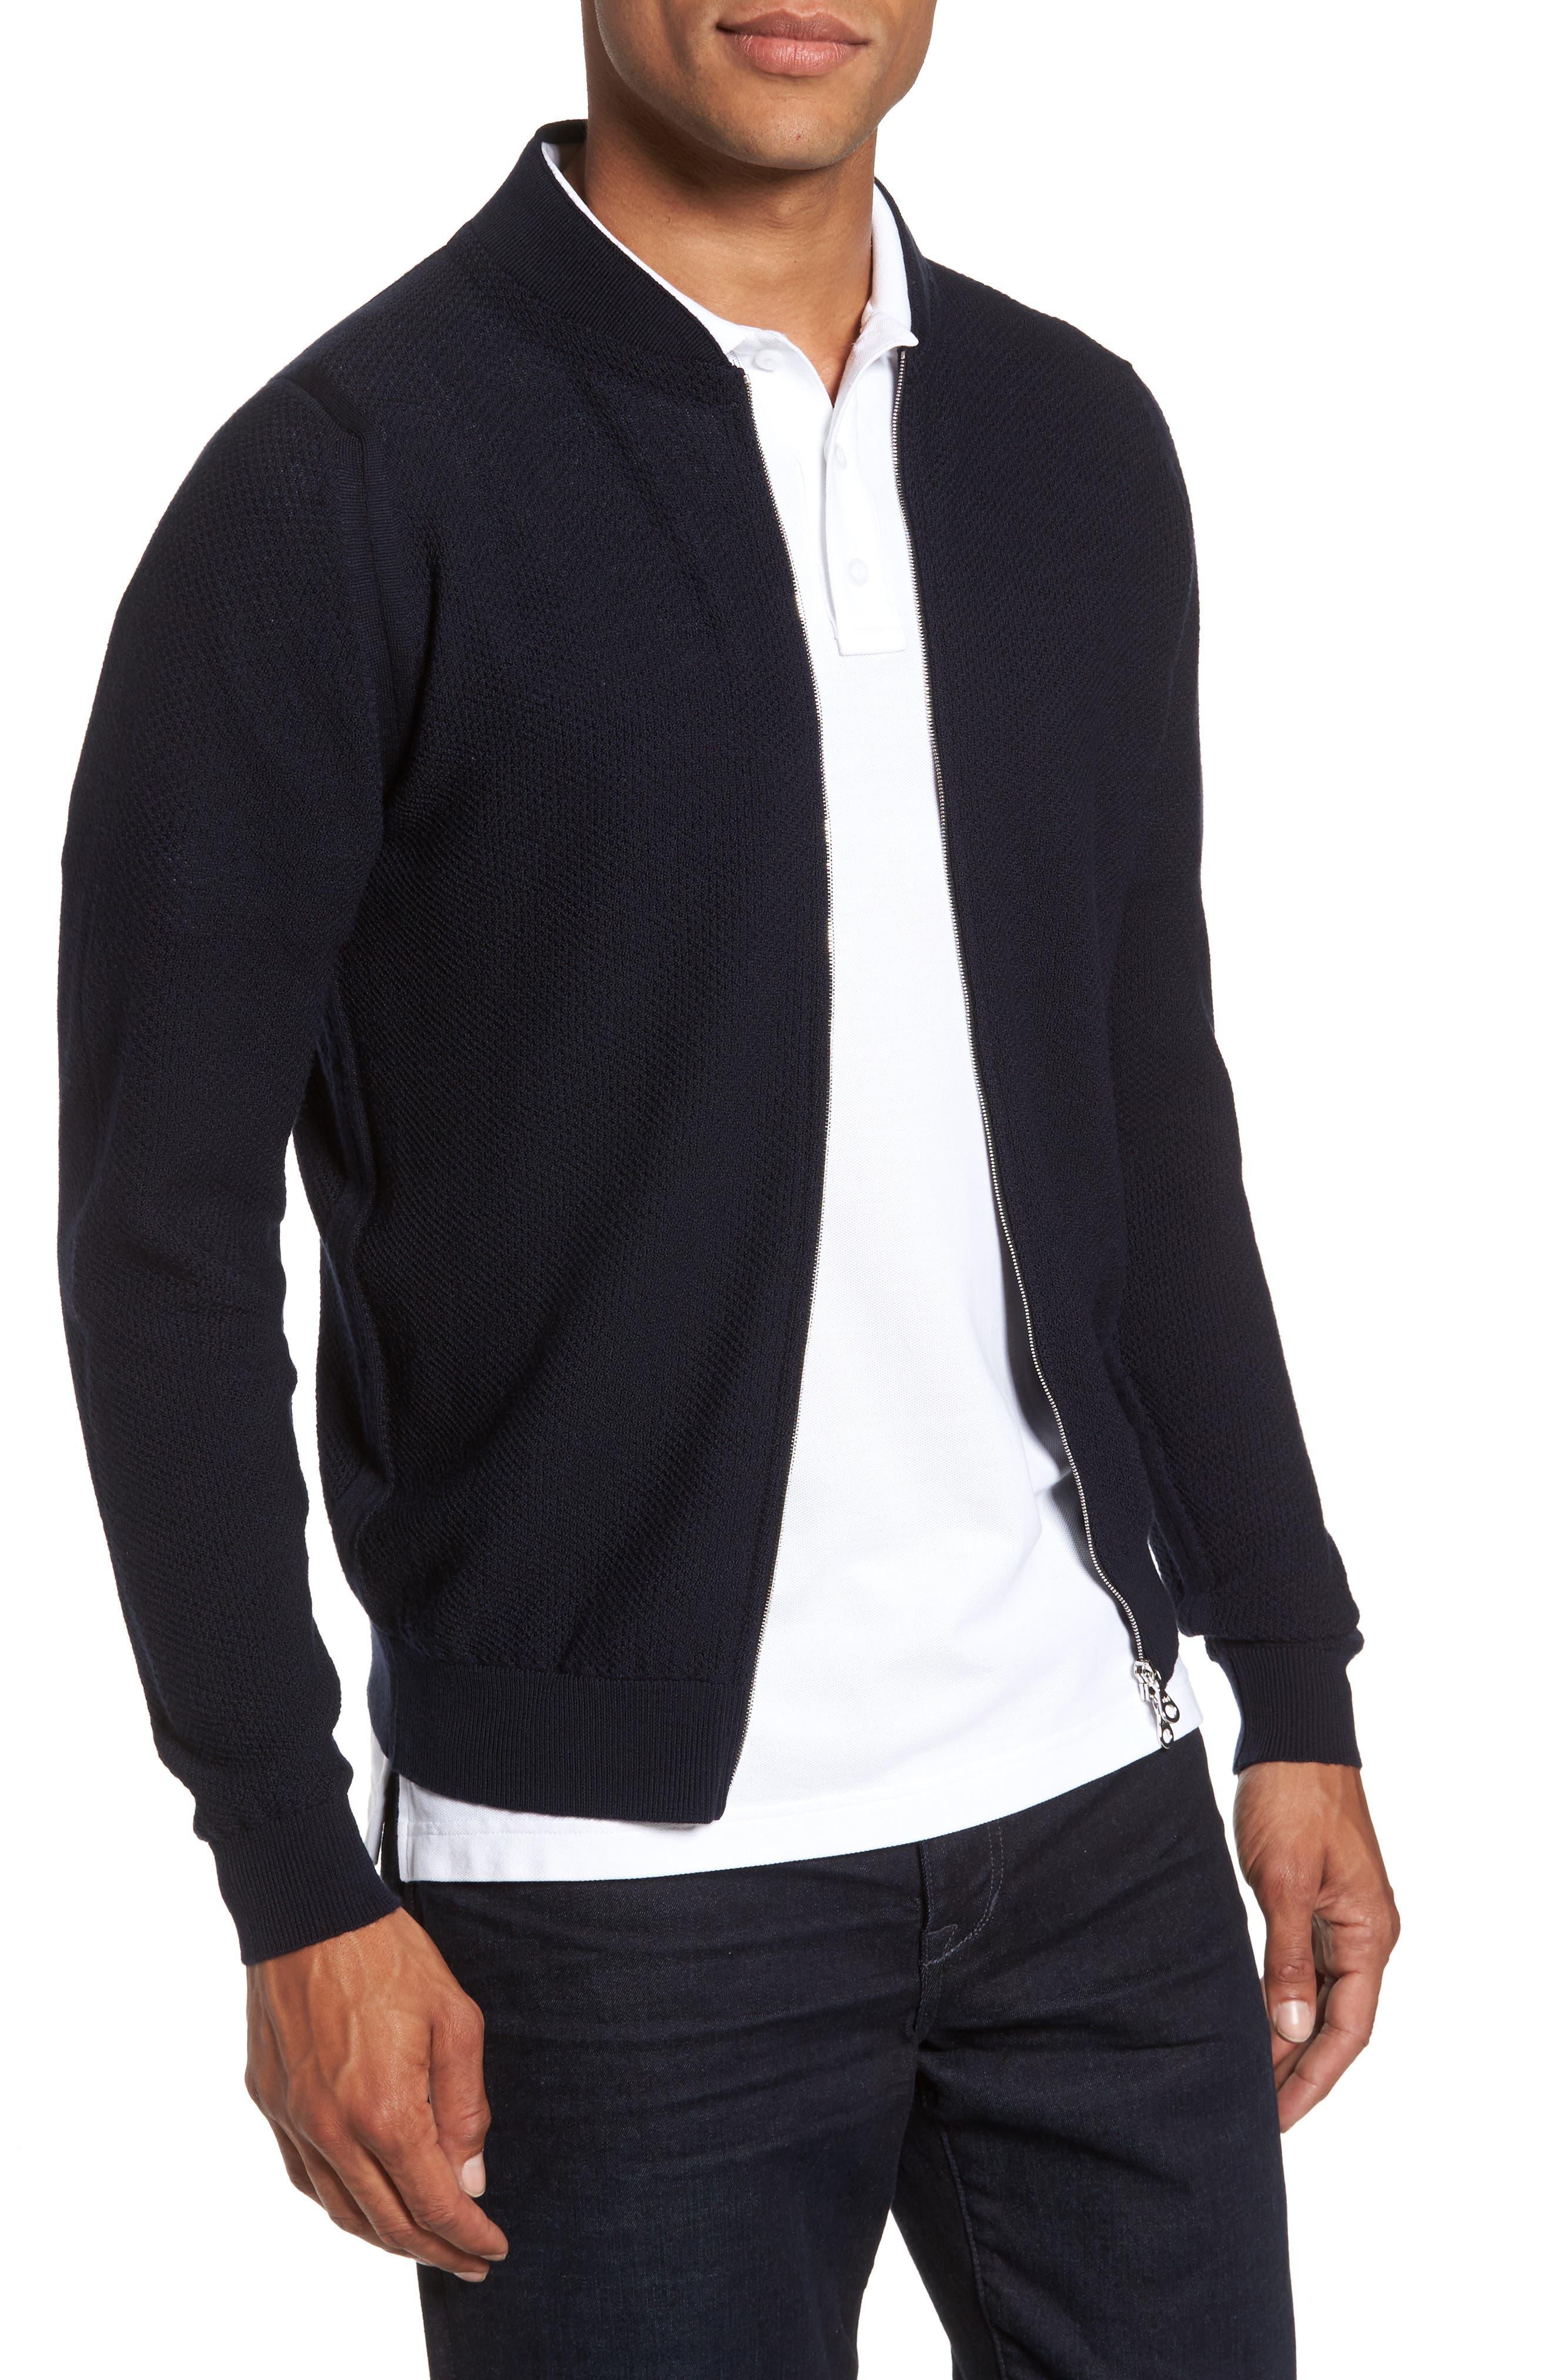 John Smedley Standard Fit Merino Wool Knit Jacket